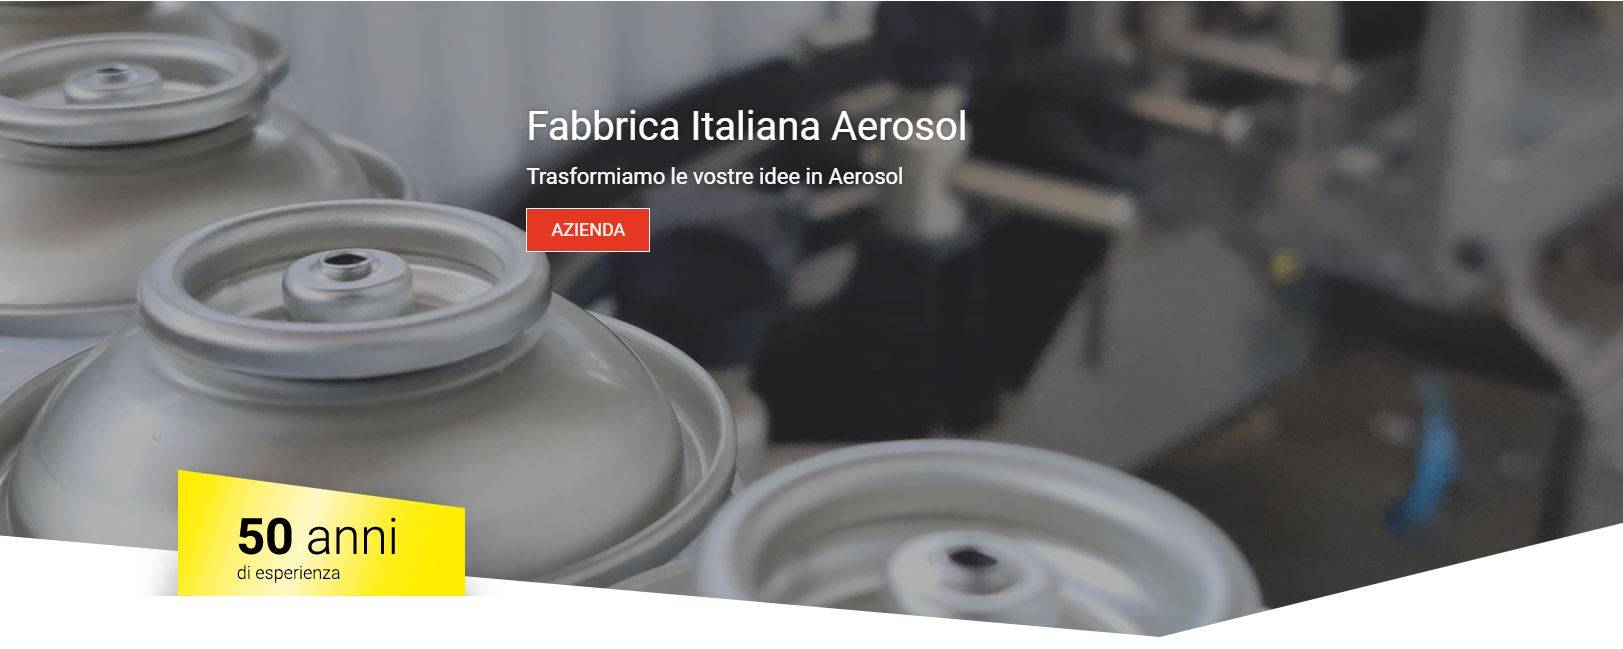 Sito web FIA Spray